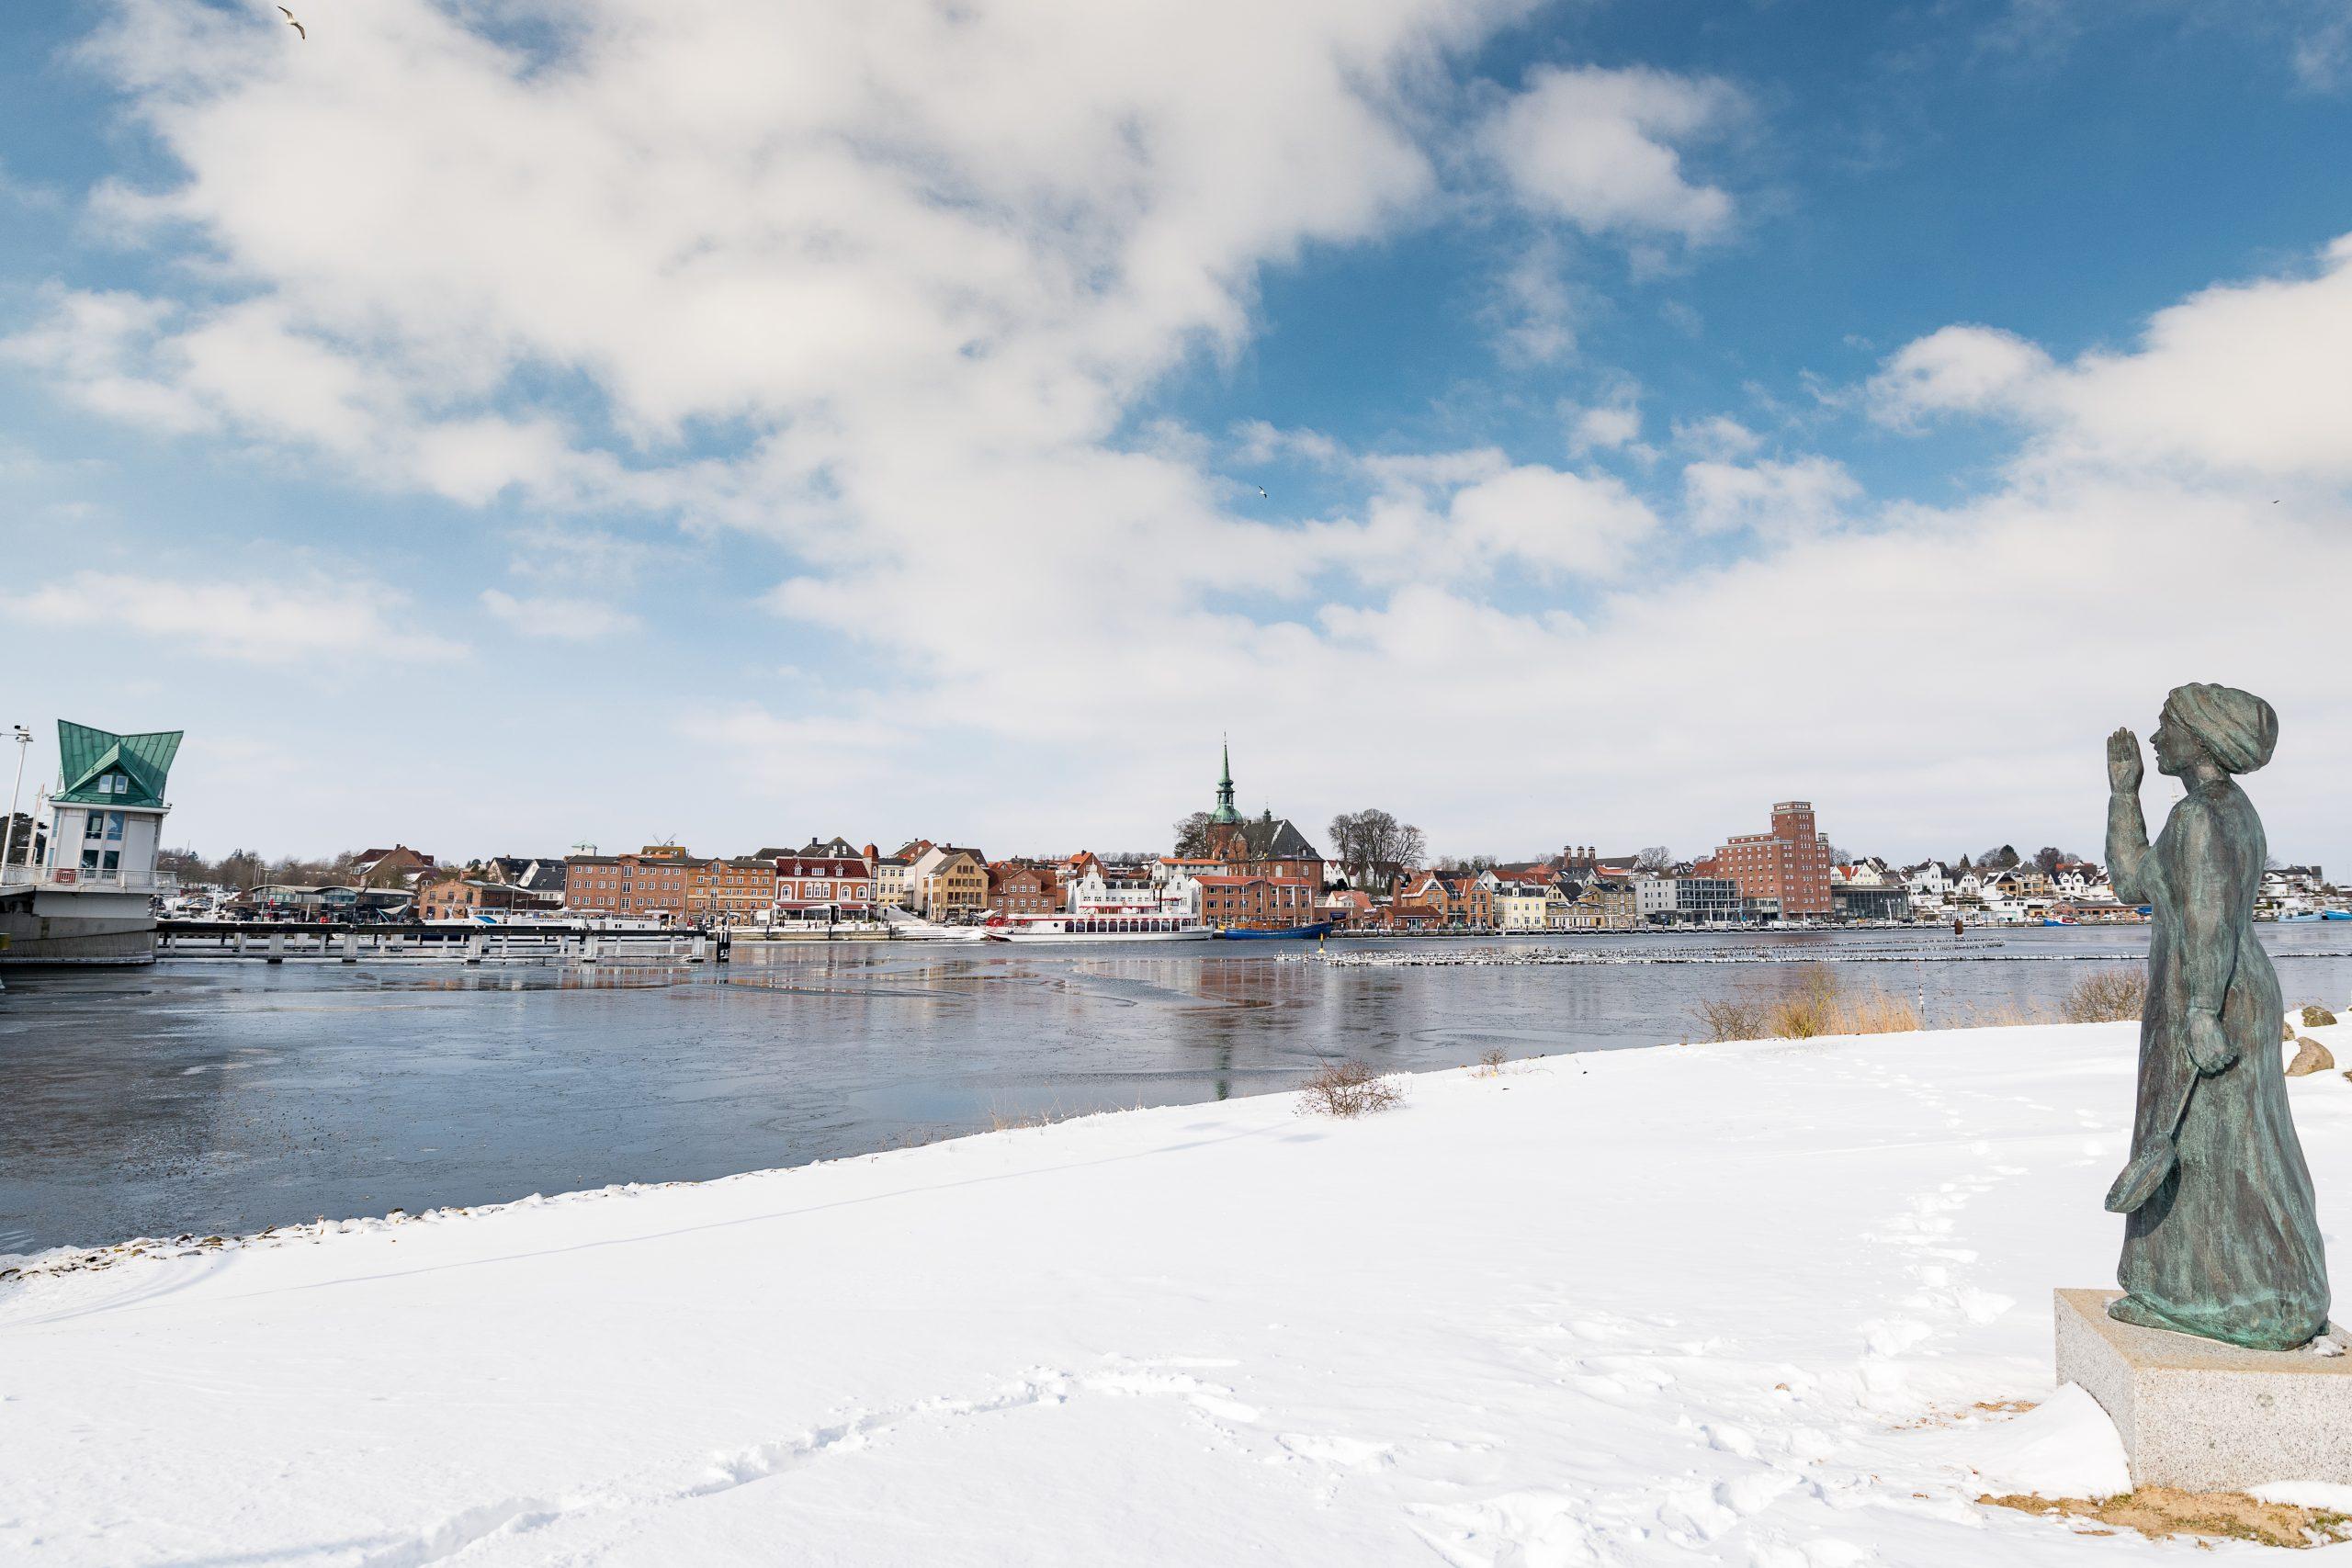 © Ostseefjord/ Anna Leste Matzen